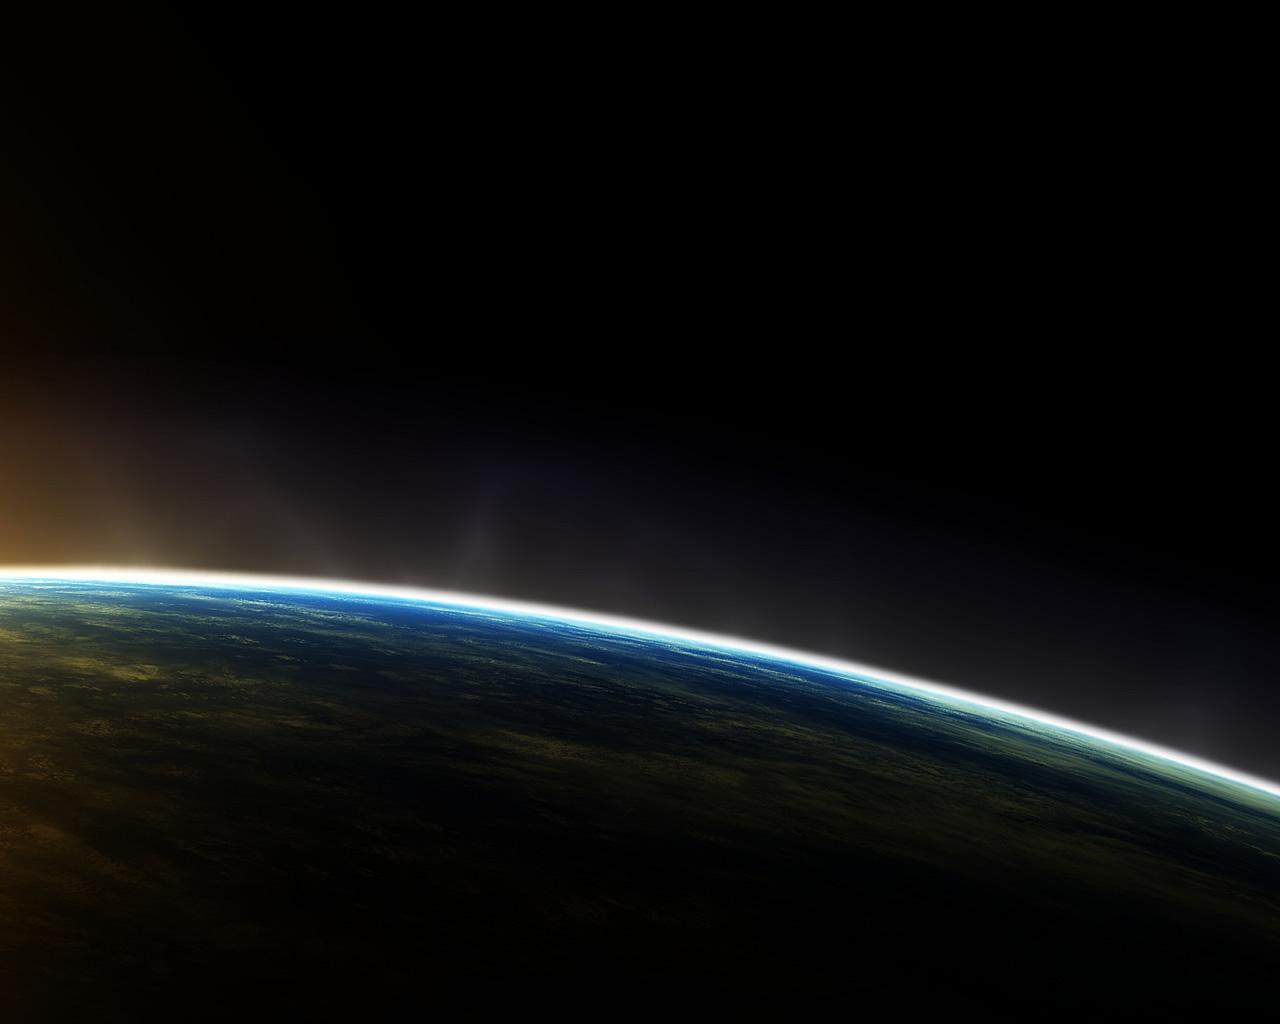 Planet by GizardBoy